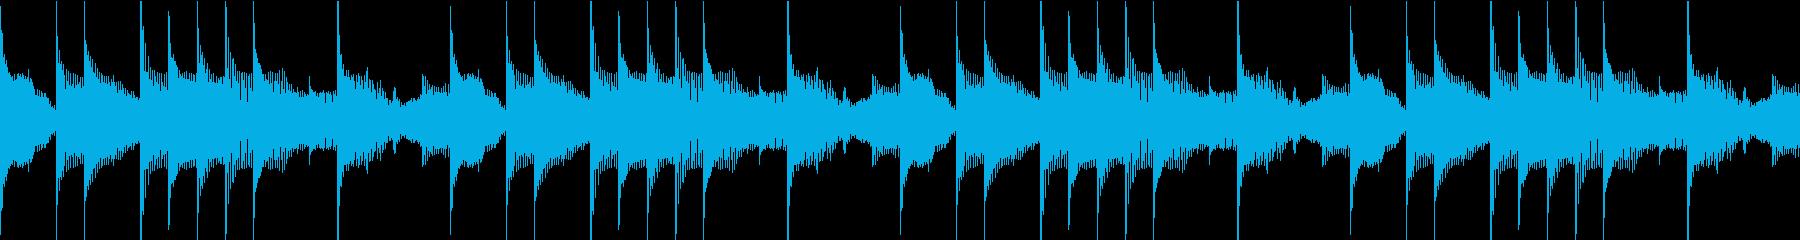 SFX 思考 推察 考える ループの再生済みの波形